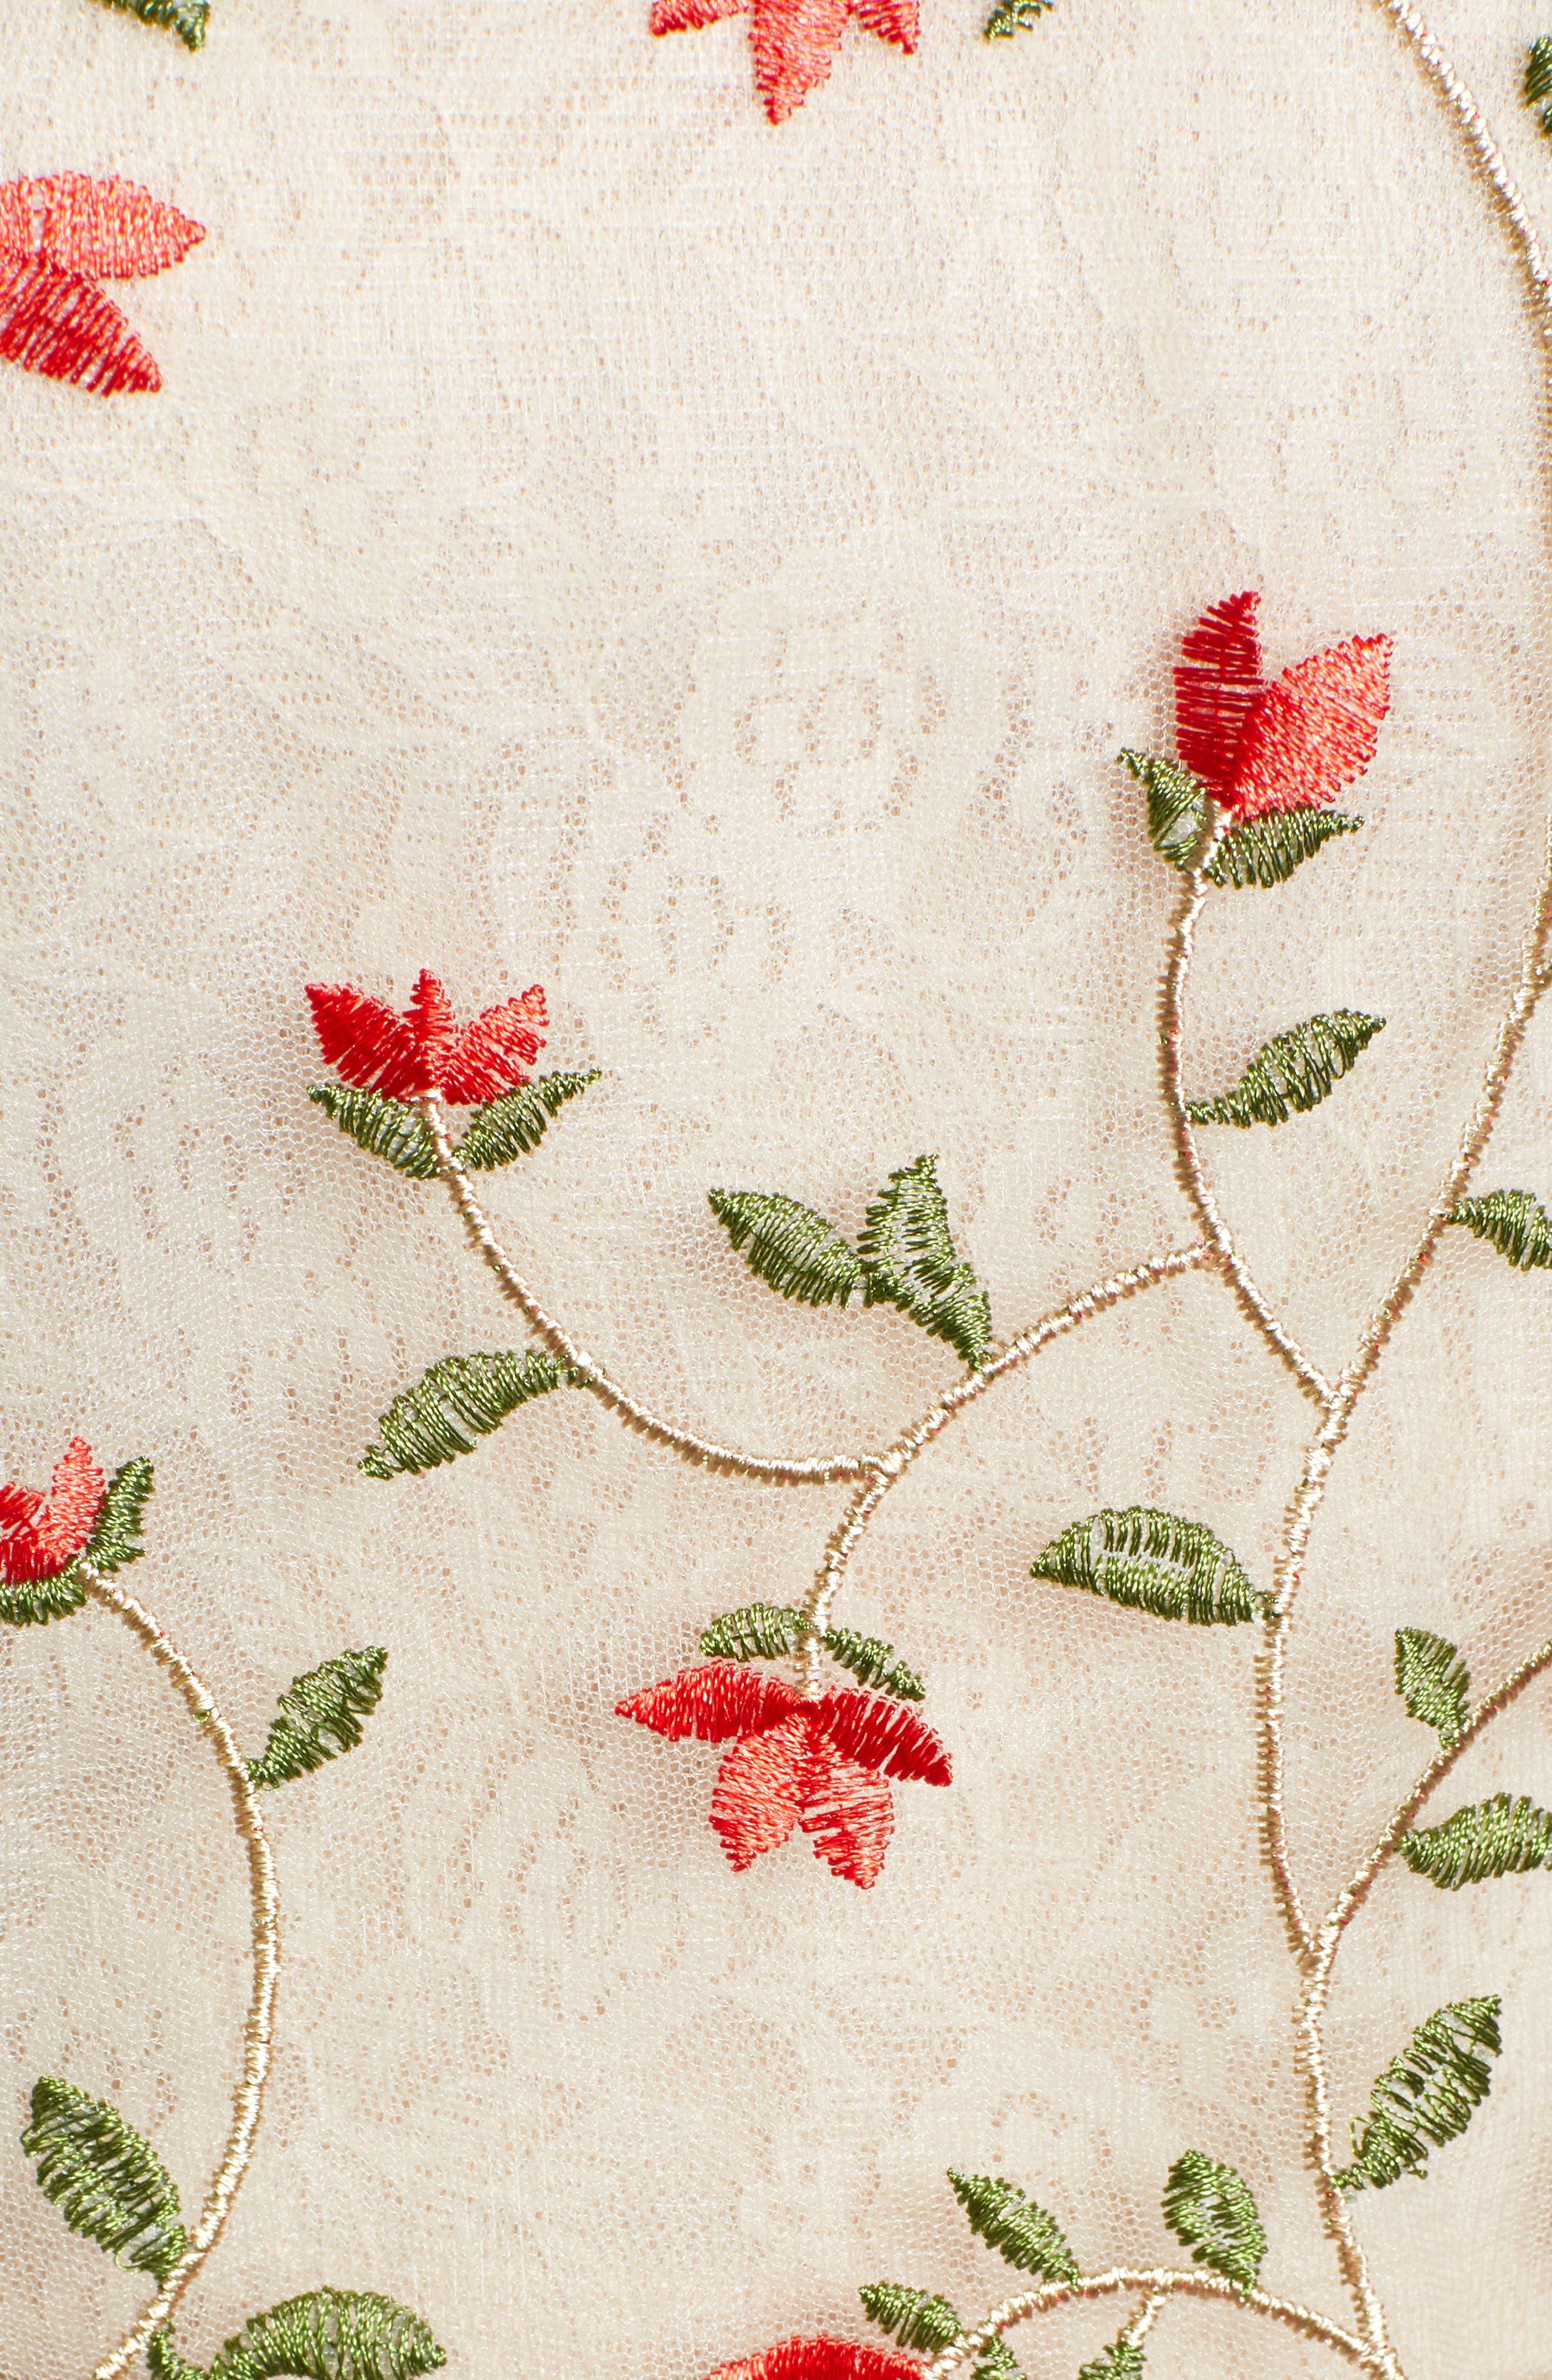 Floral Mesh Top,                             Alternate thumbnail 5, color,                             MULTI